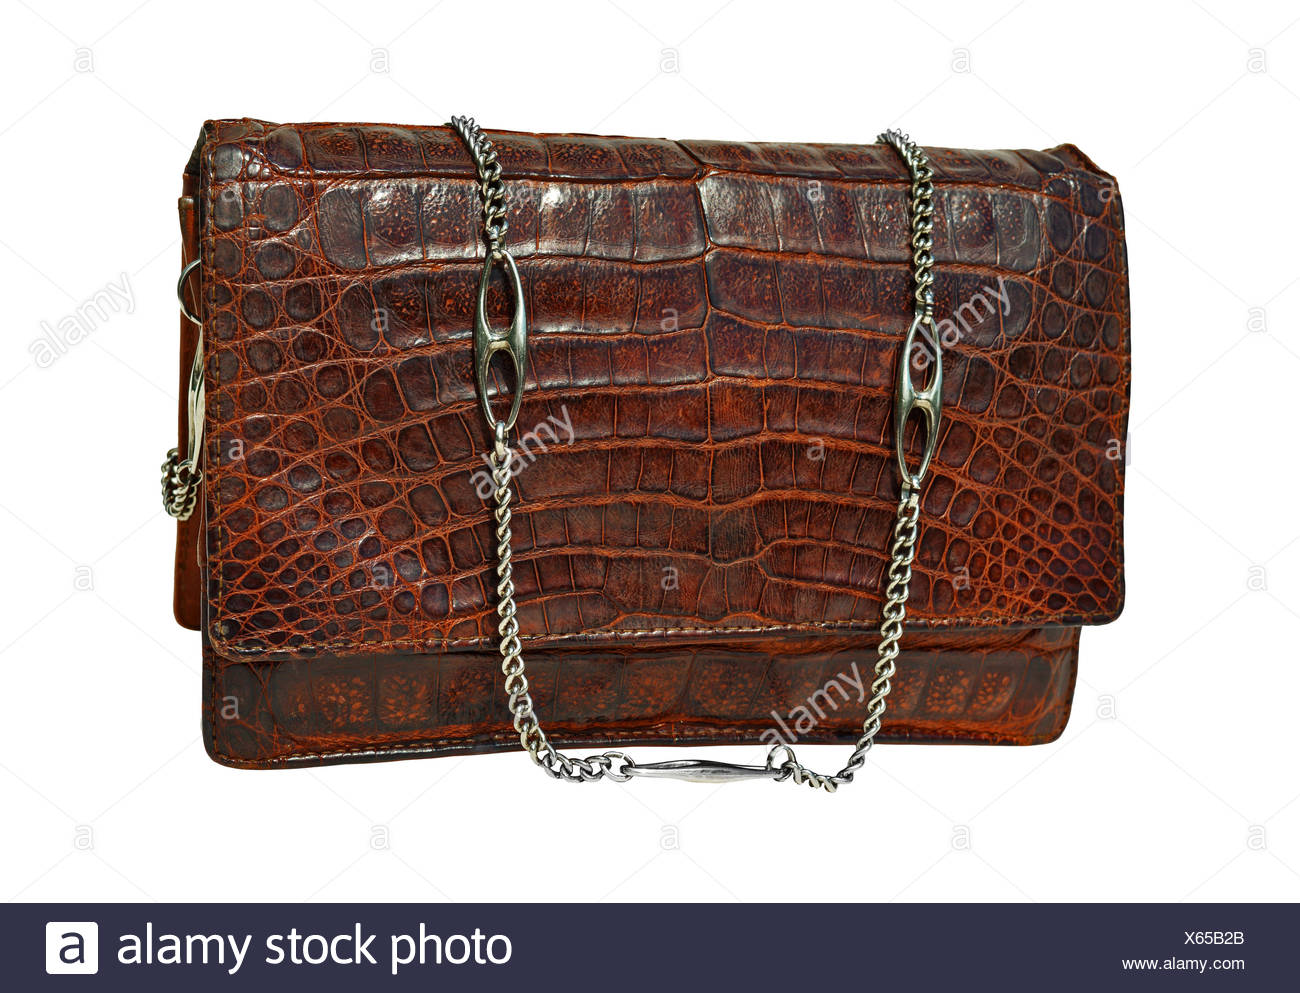 c82b33424 Alligator Skin Bag Stock Photos & Alligator Skin Bag Stock Images ...